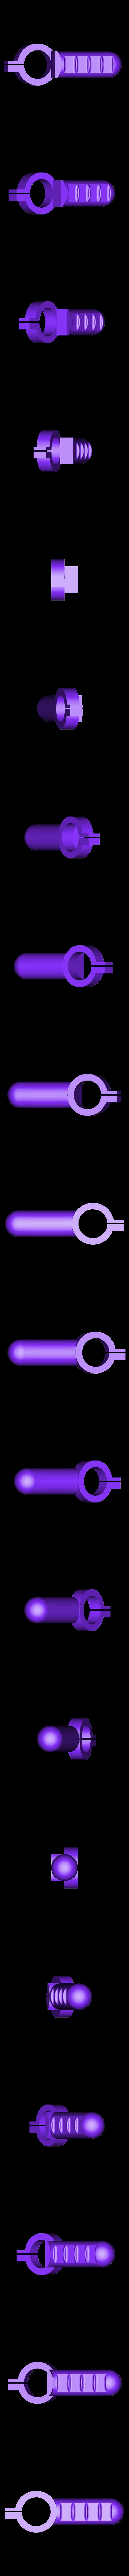 Drill_Handle_v2.0.stl Télécharger fichier STL gratuit Manche de perceuse Ryobi • Design imprimable en 3D, garrettlogan